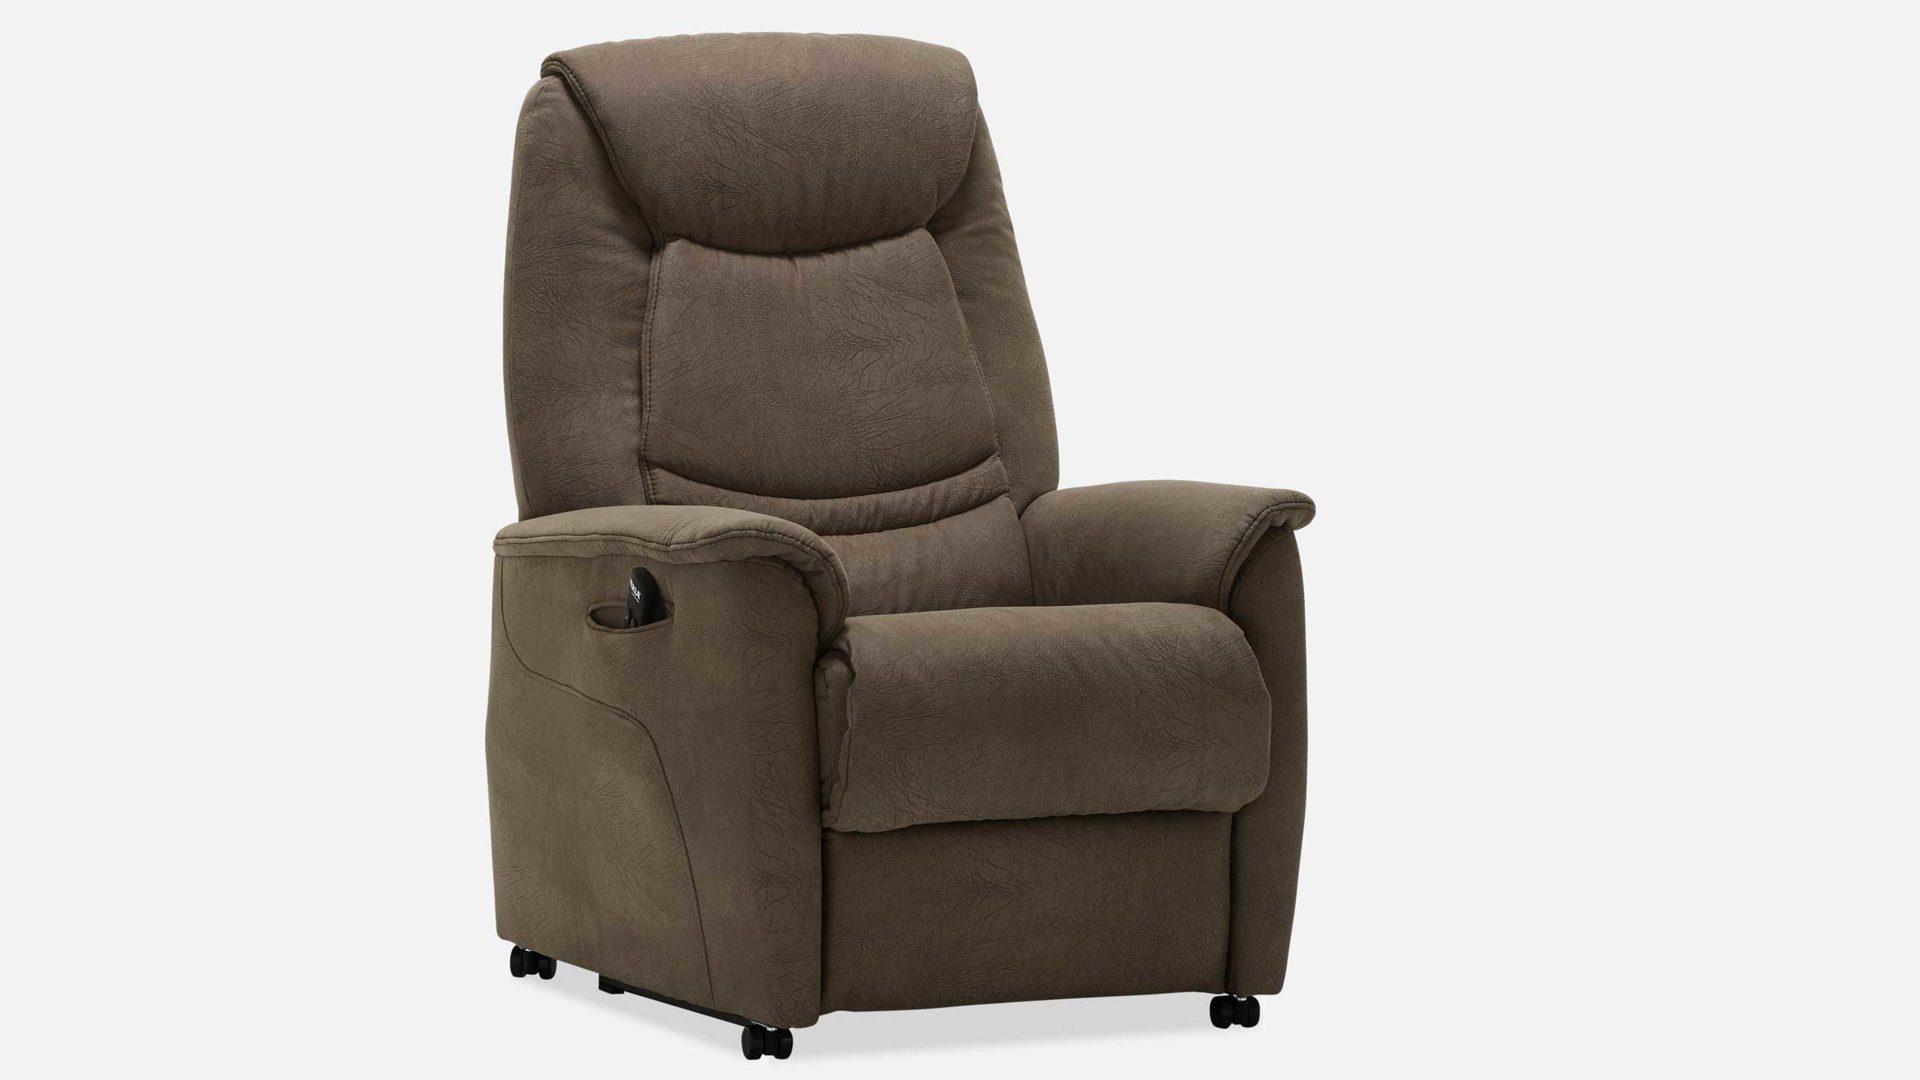 Hukla Relaxsessel Sessel Rv88 A8 Stoffbezug Braun Stoff Leonardo 19 Braun Funktion A8 Ein Motor Aufstehhilfe